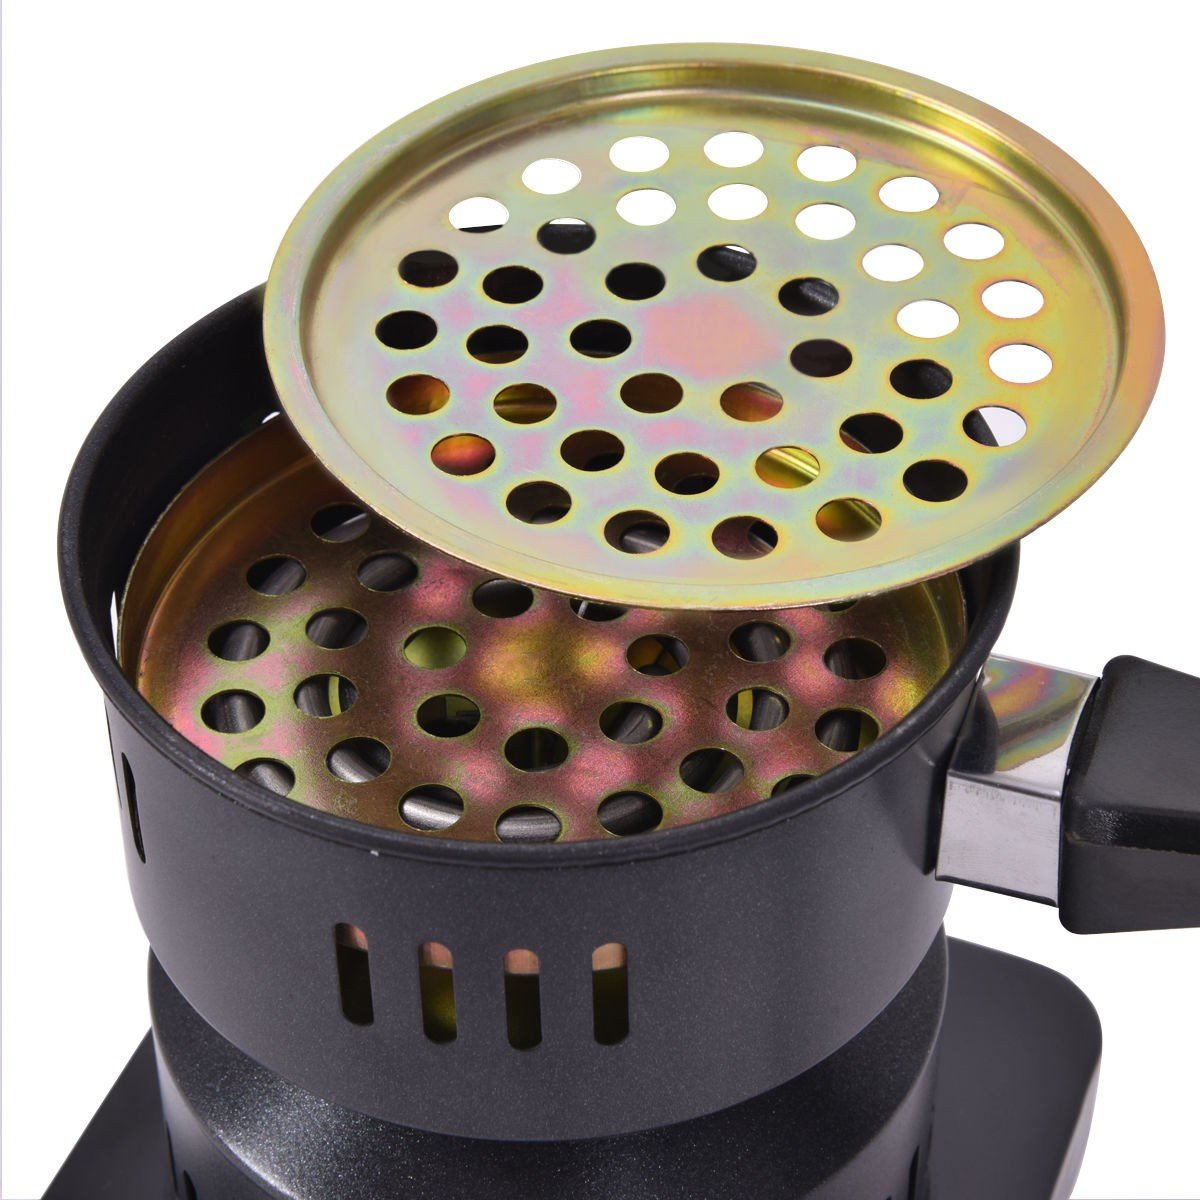 Electric Charcoal Starter Hookah Shisha Nargila Heater Stove Charcoal Burner Costway by COSTWAY (Image #4)